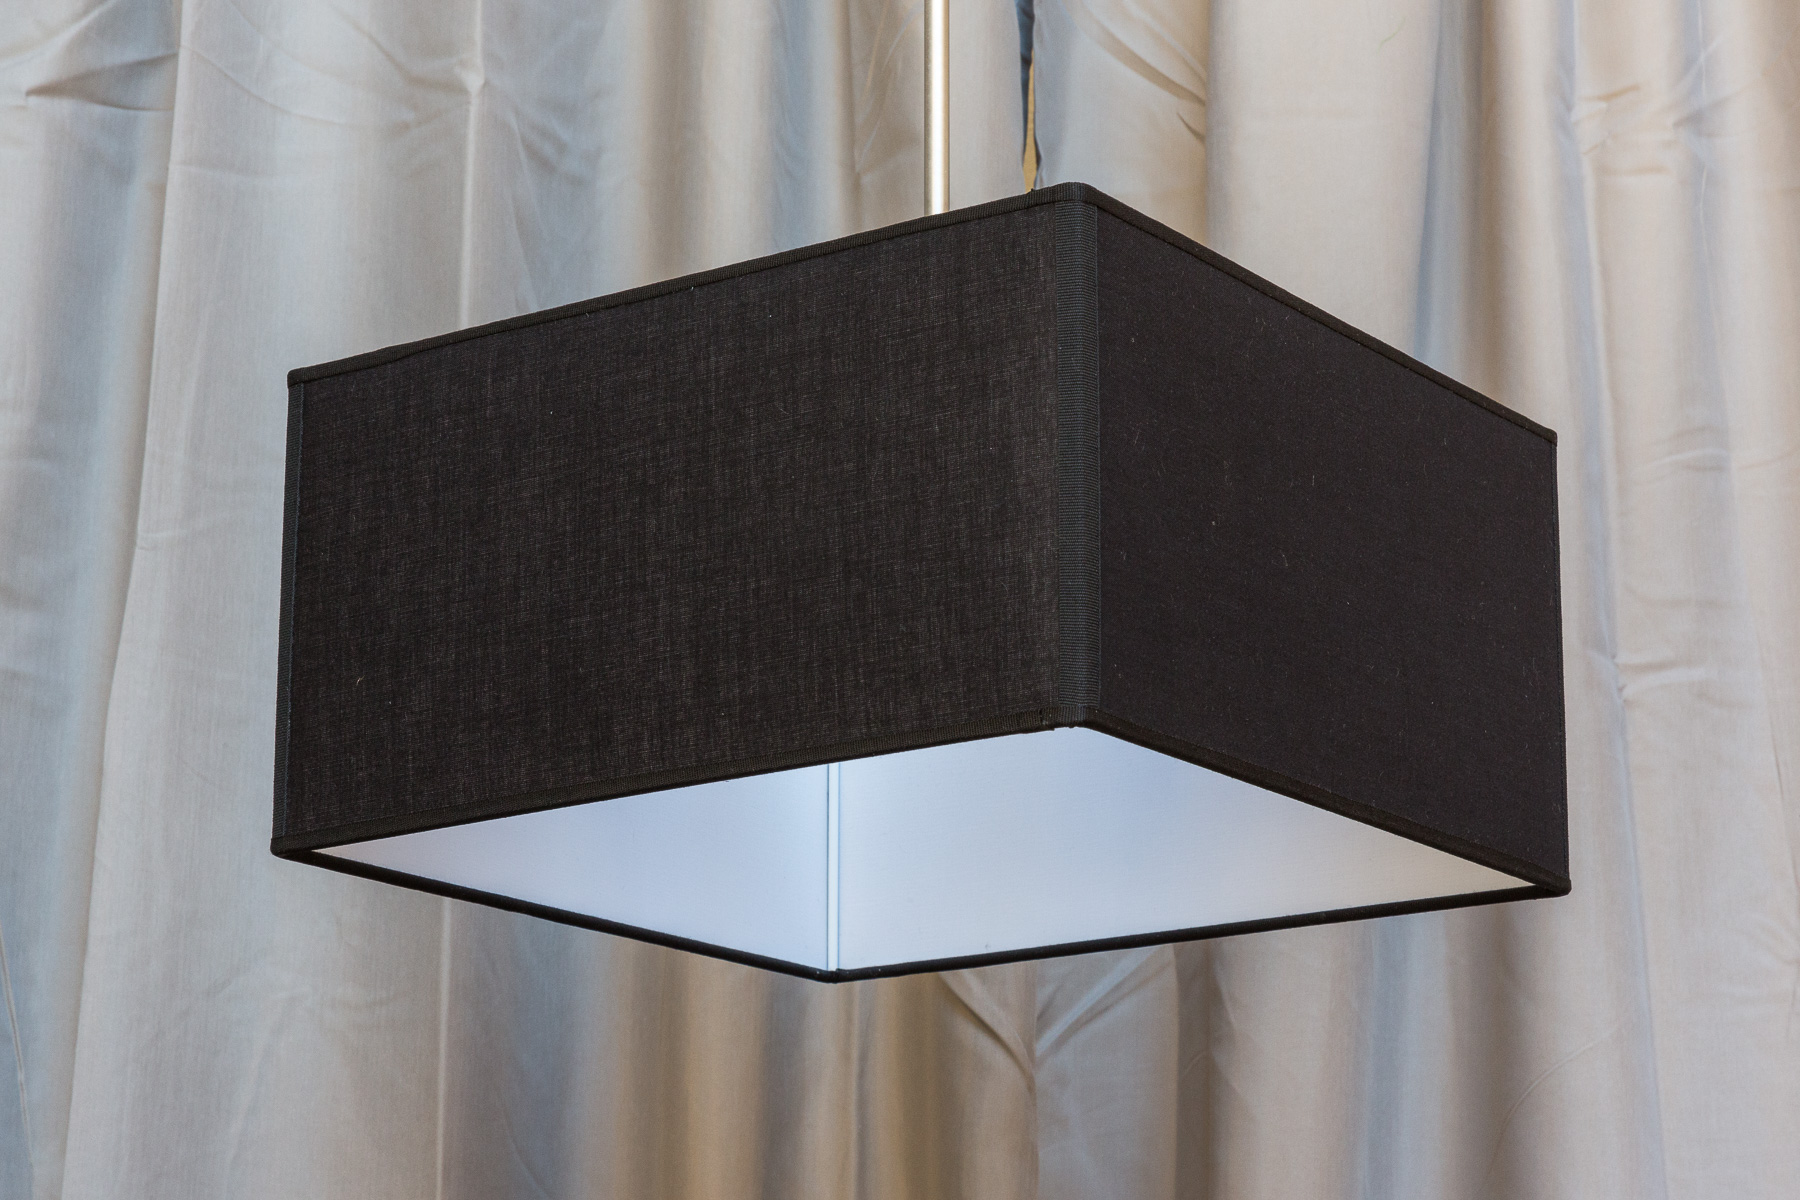 lampadari stile moderno : Lampadari a sospensione, stile moderno